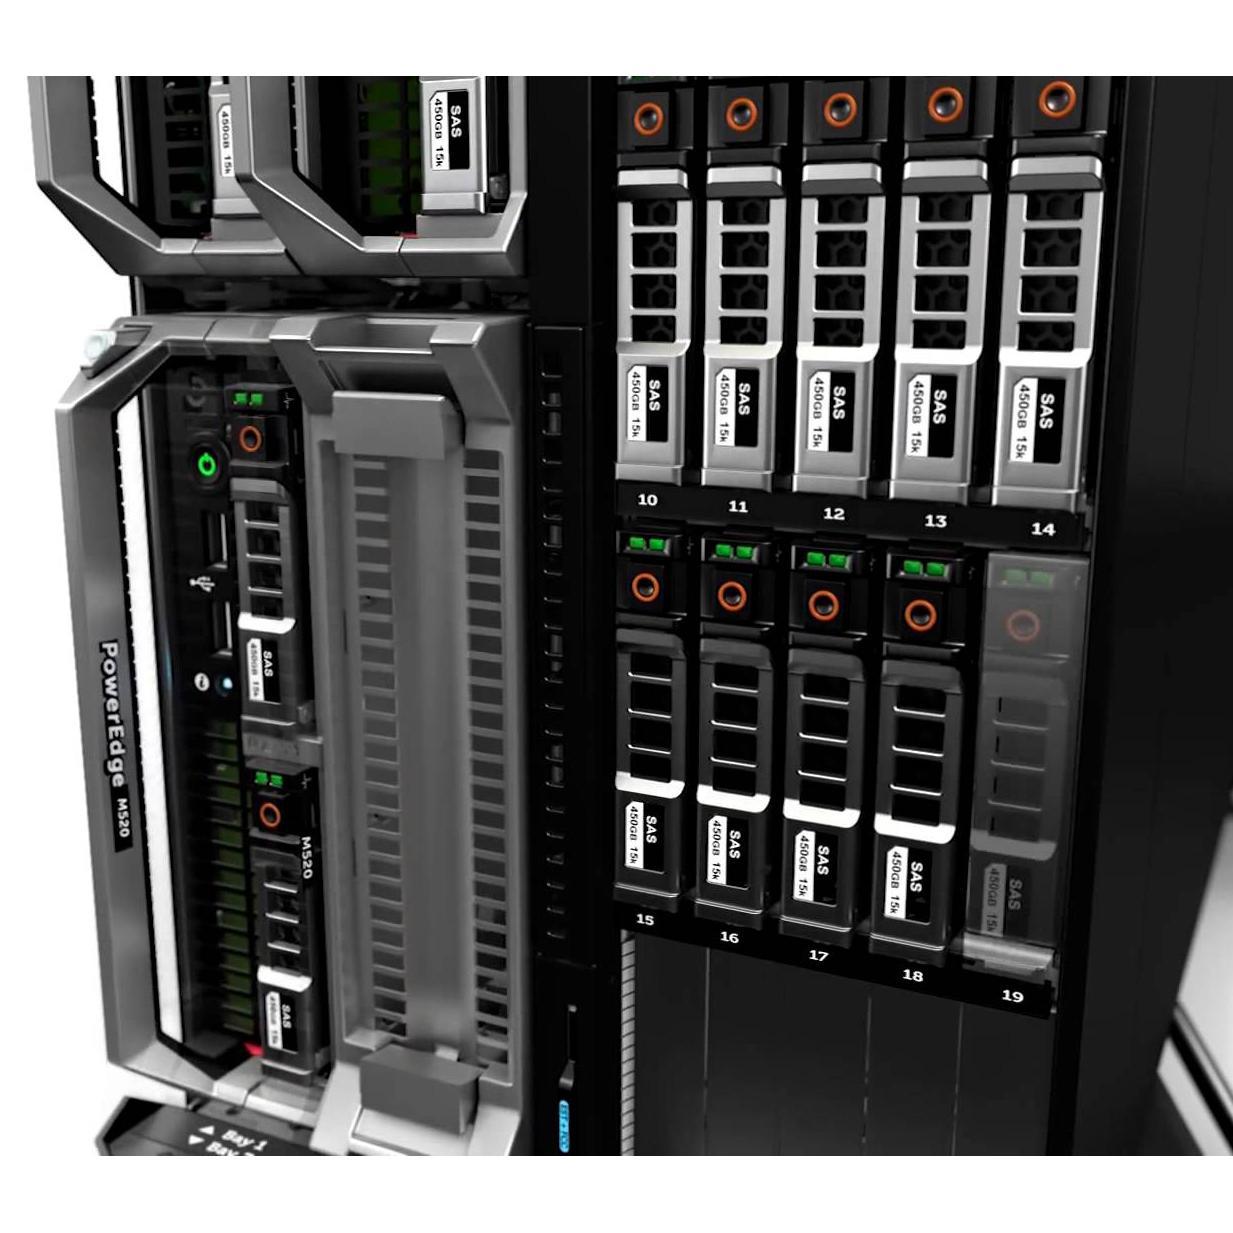 Dell Savvio 15K.2 Disque dur 2,5'' SAS - 6Gbps - 148Go - 15K